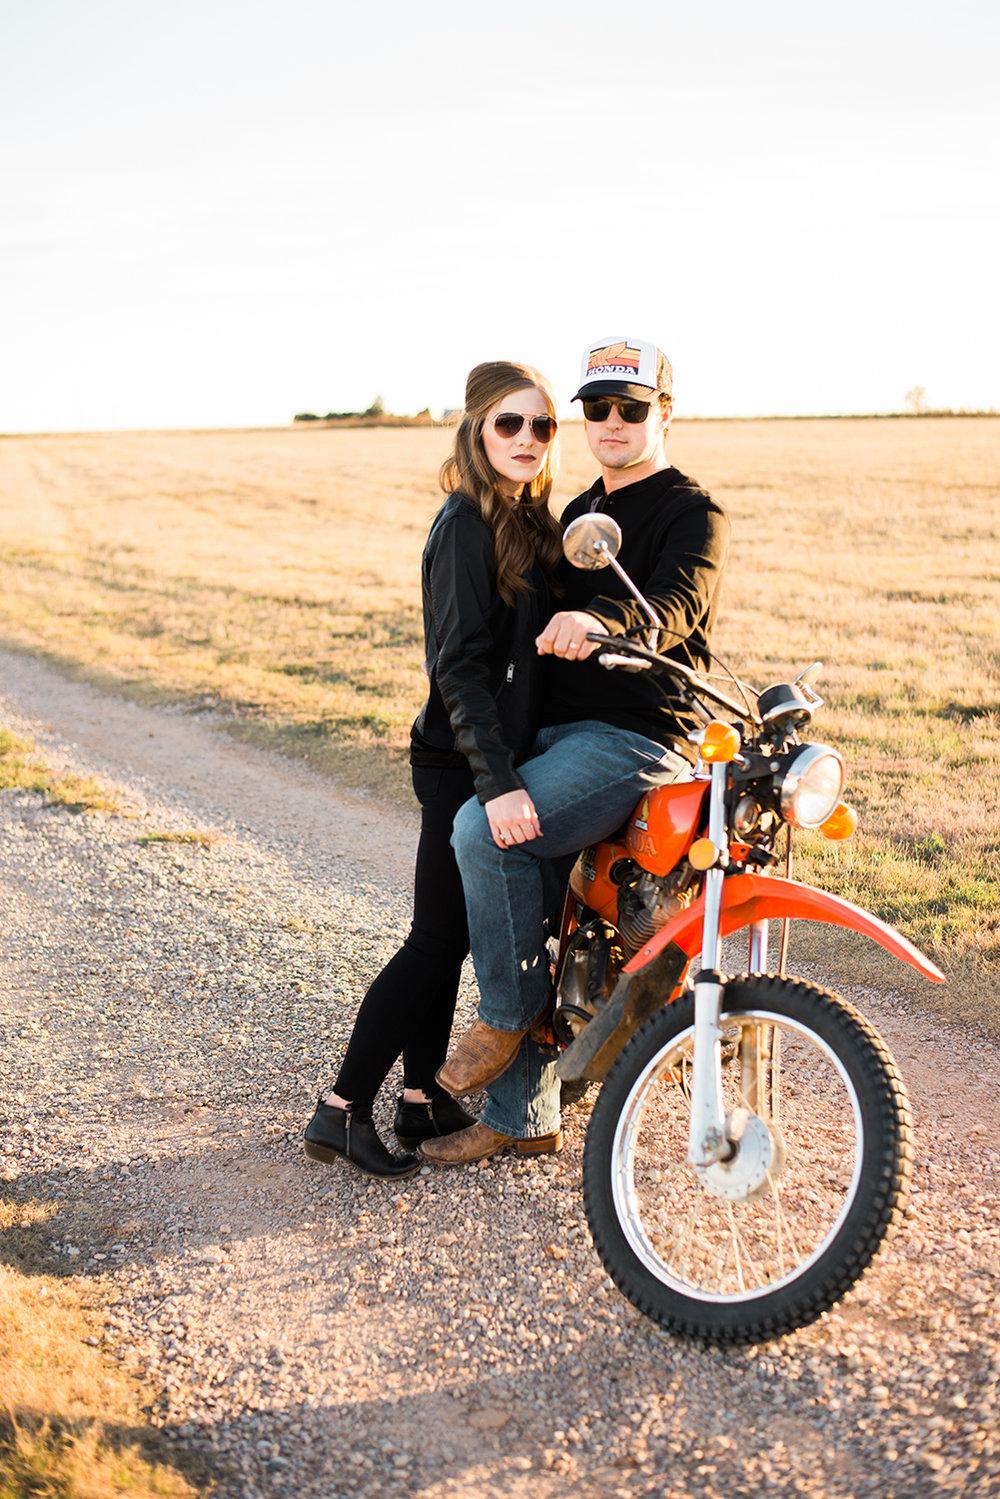 edgy-motorcycle-couple-shoot-denver-photographer-5.jpg